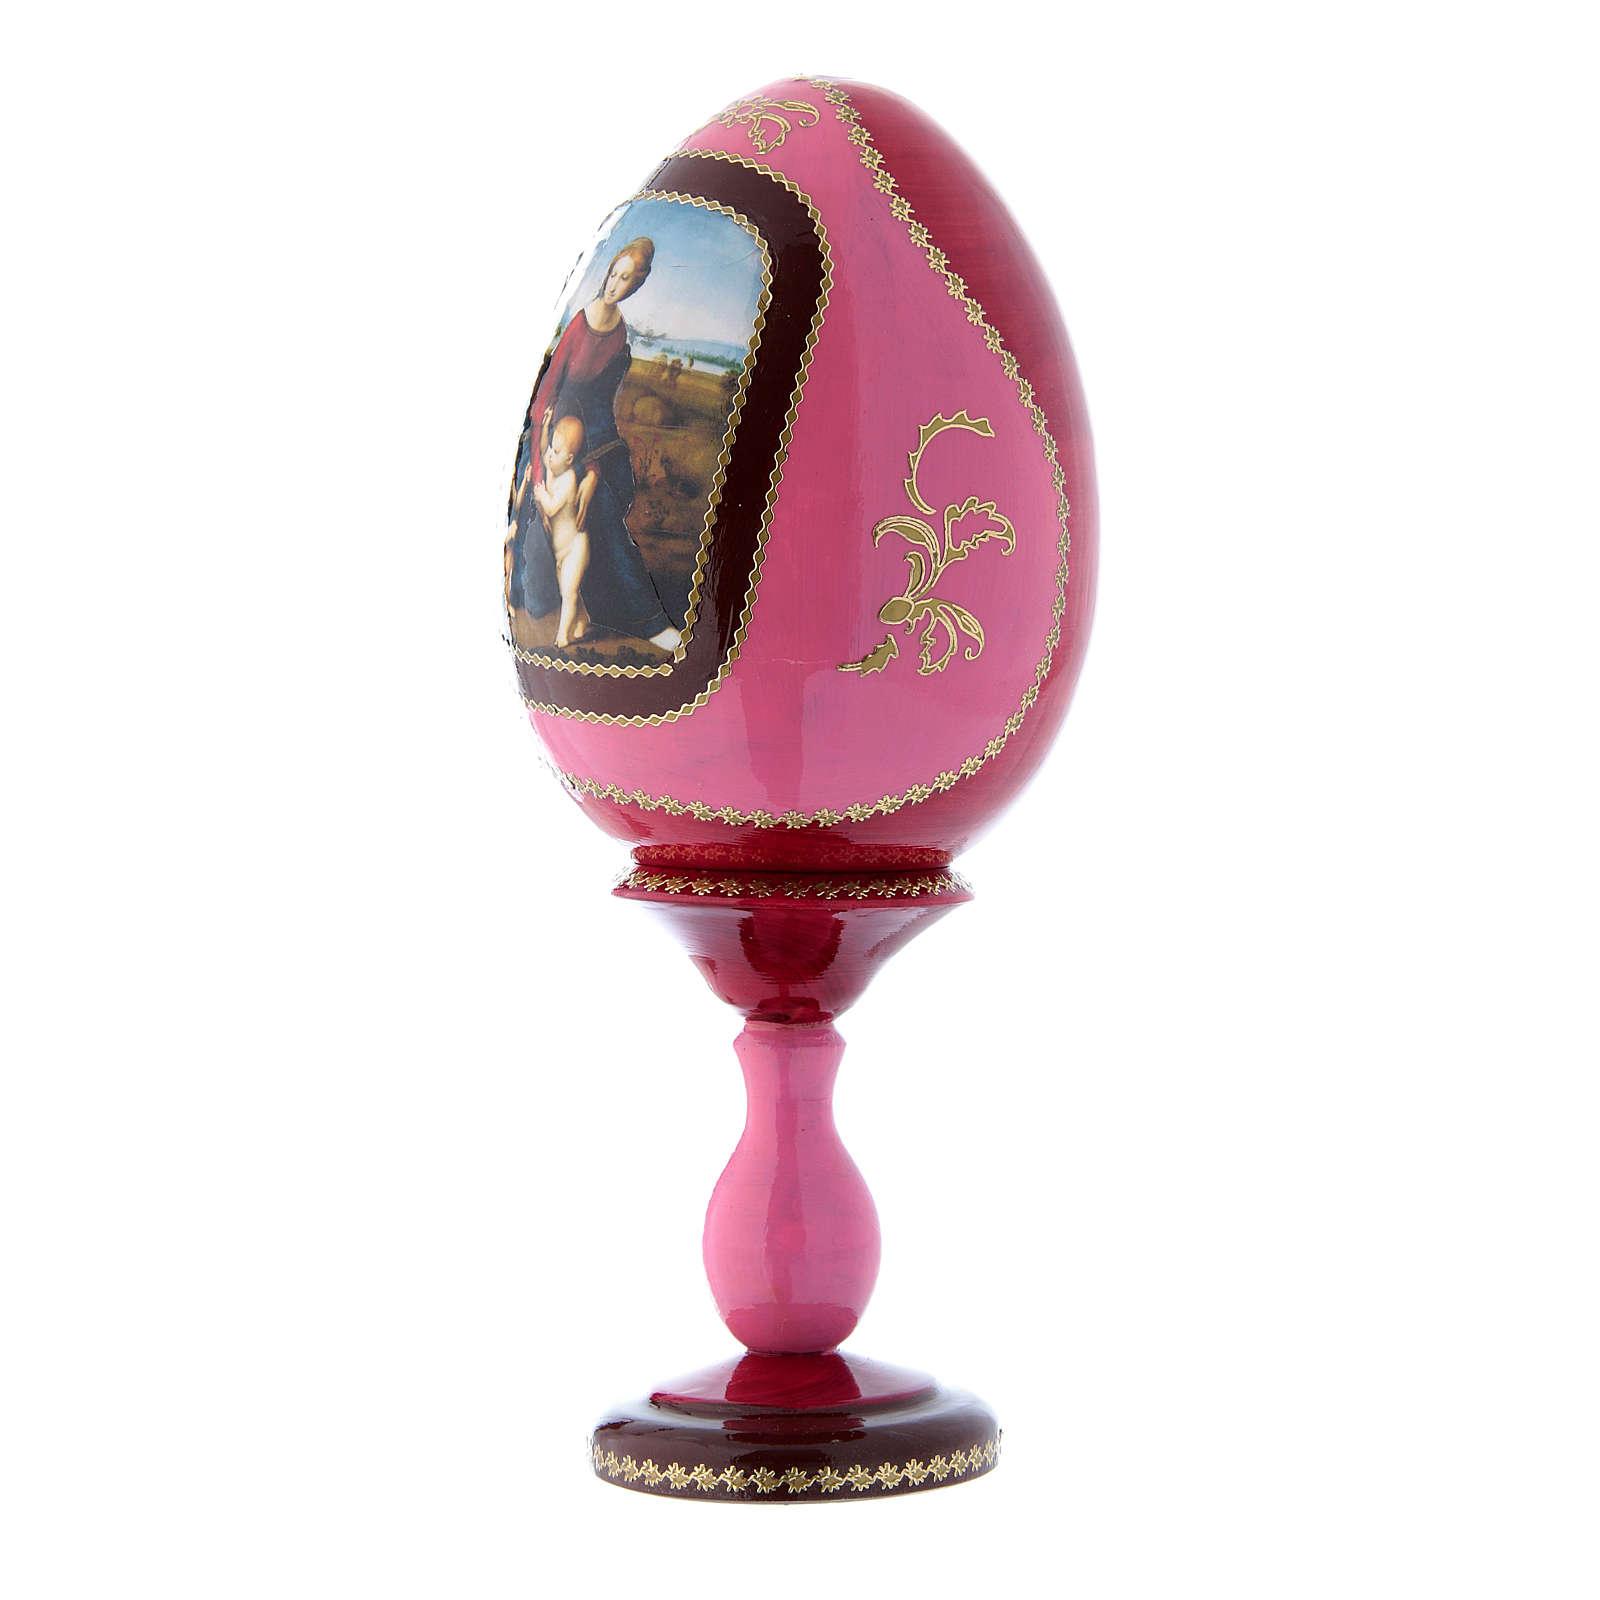 Huevo de madera rojo ruso estilo Fabergé La Virgen del Belvedere h tot 20 cm 4